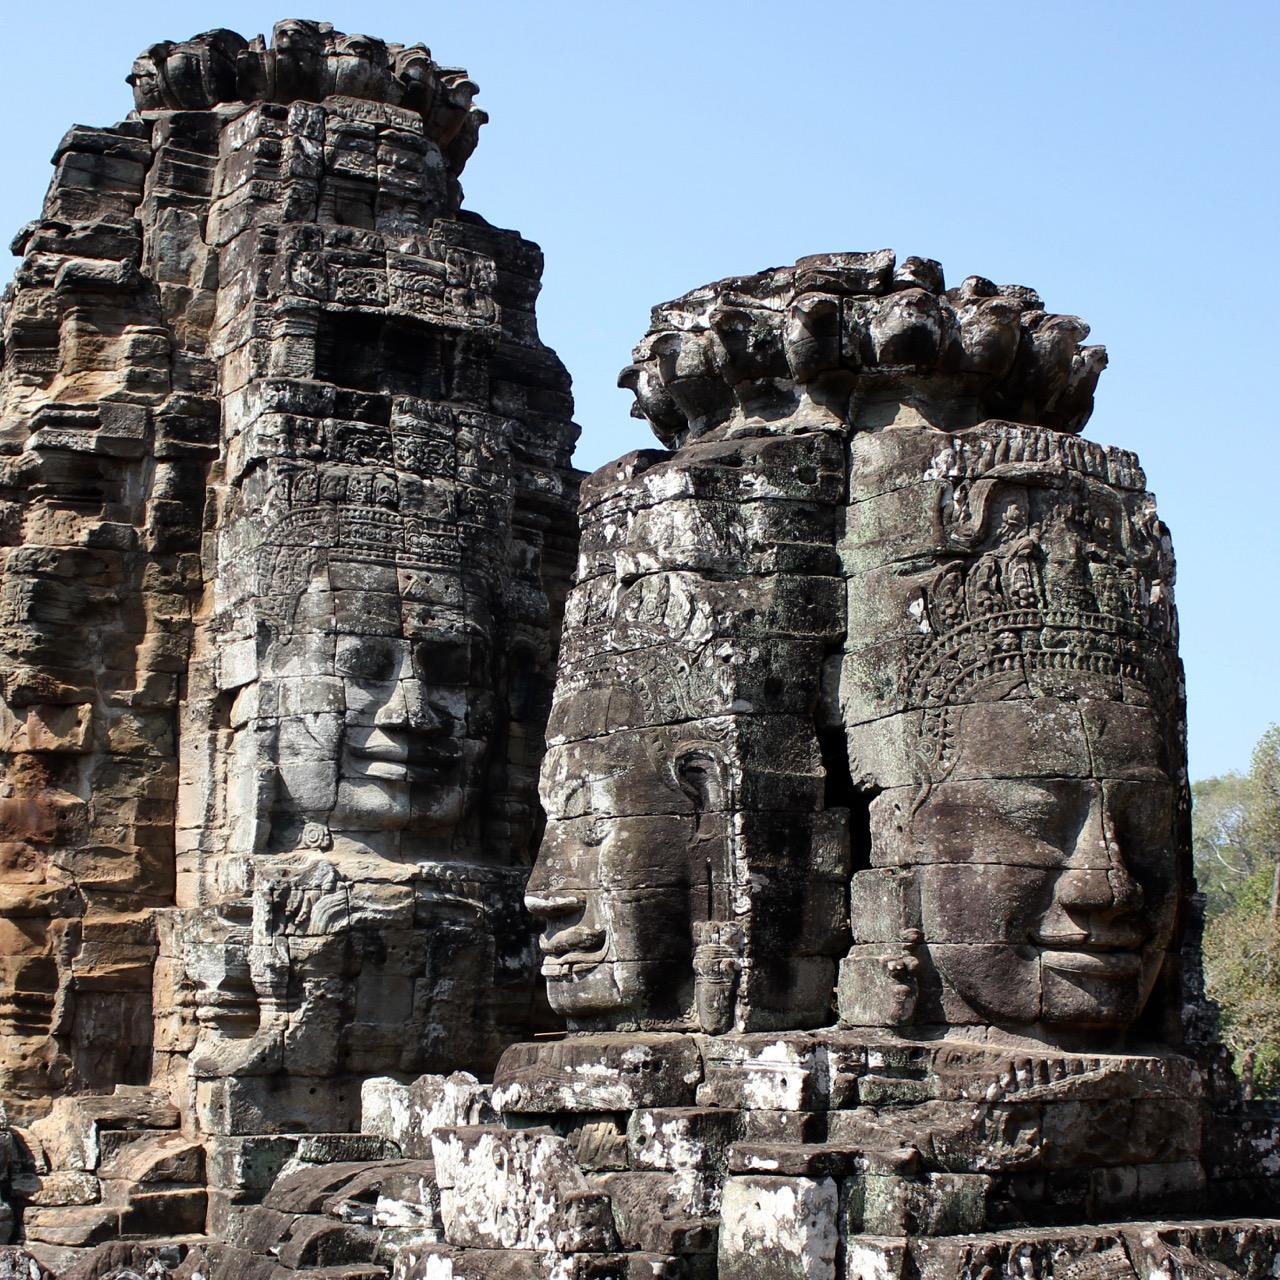 Angkor Wat, Siem Reap, Cambodia - 18